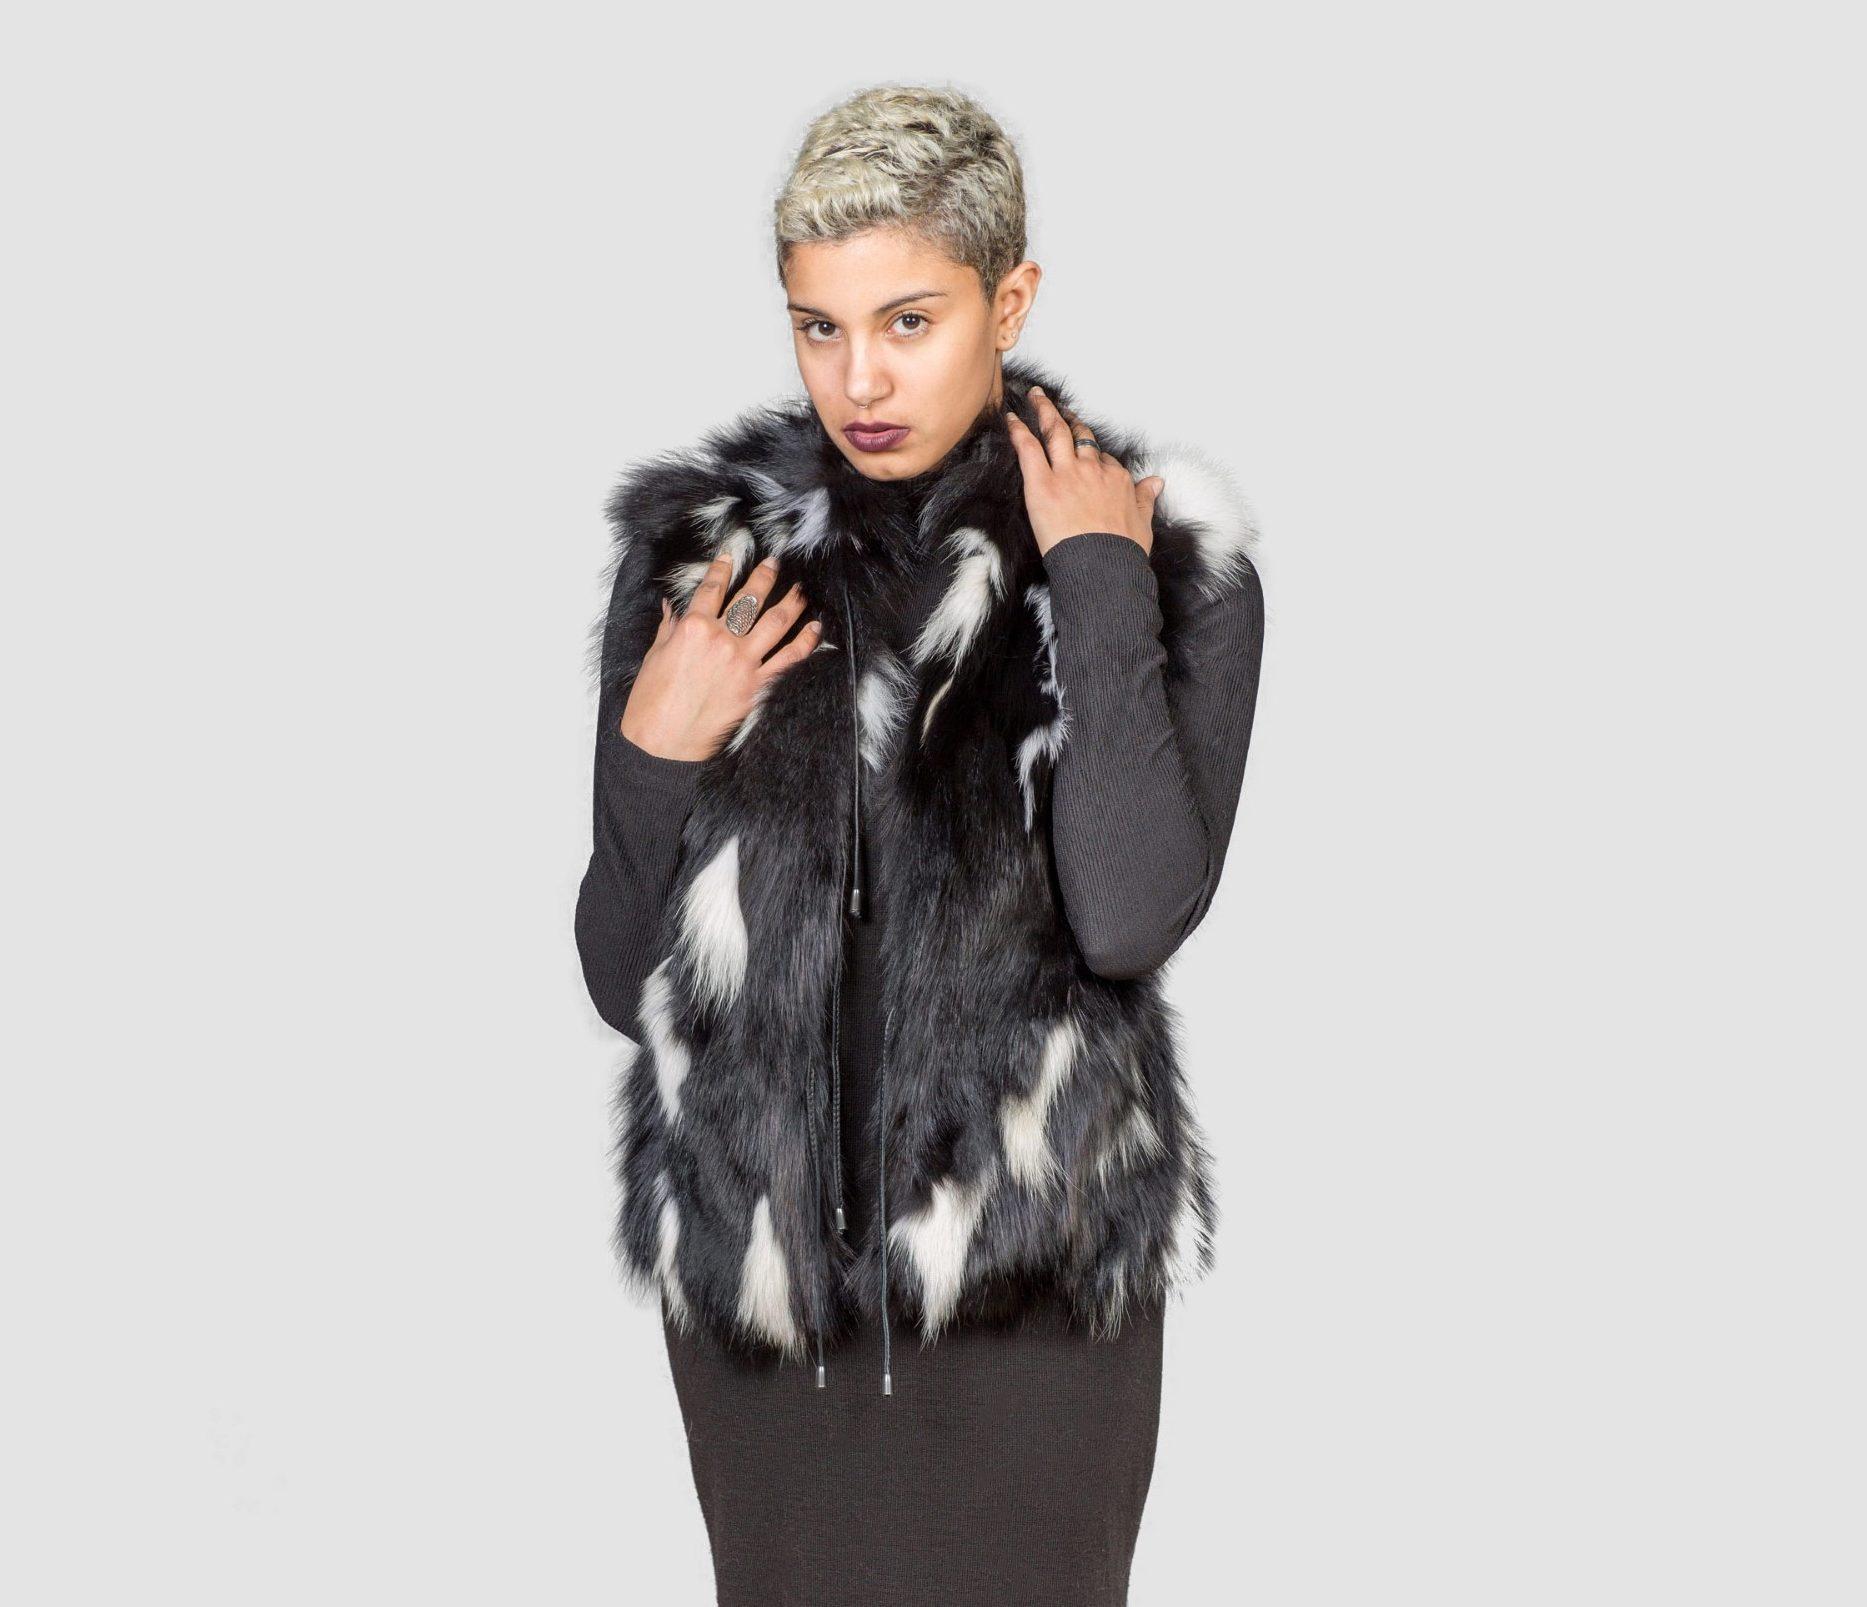 Black Fox Fur Vest With White Details - Real Fur Coats , Vests ...